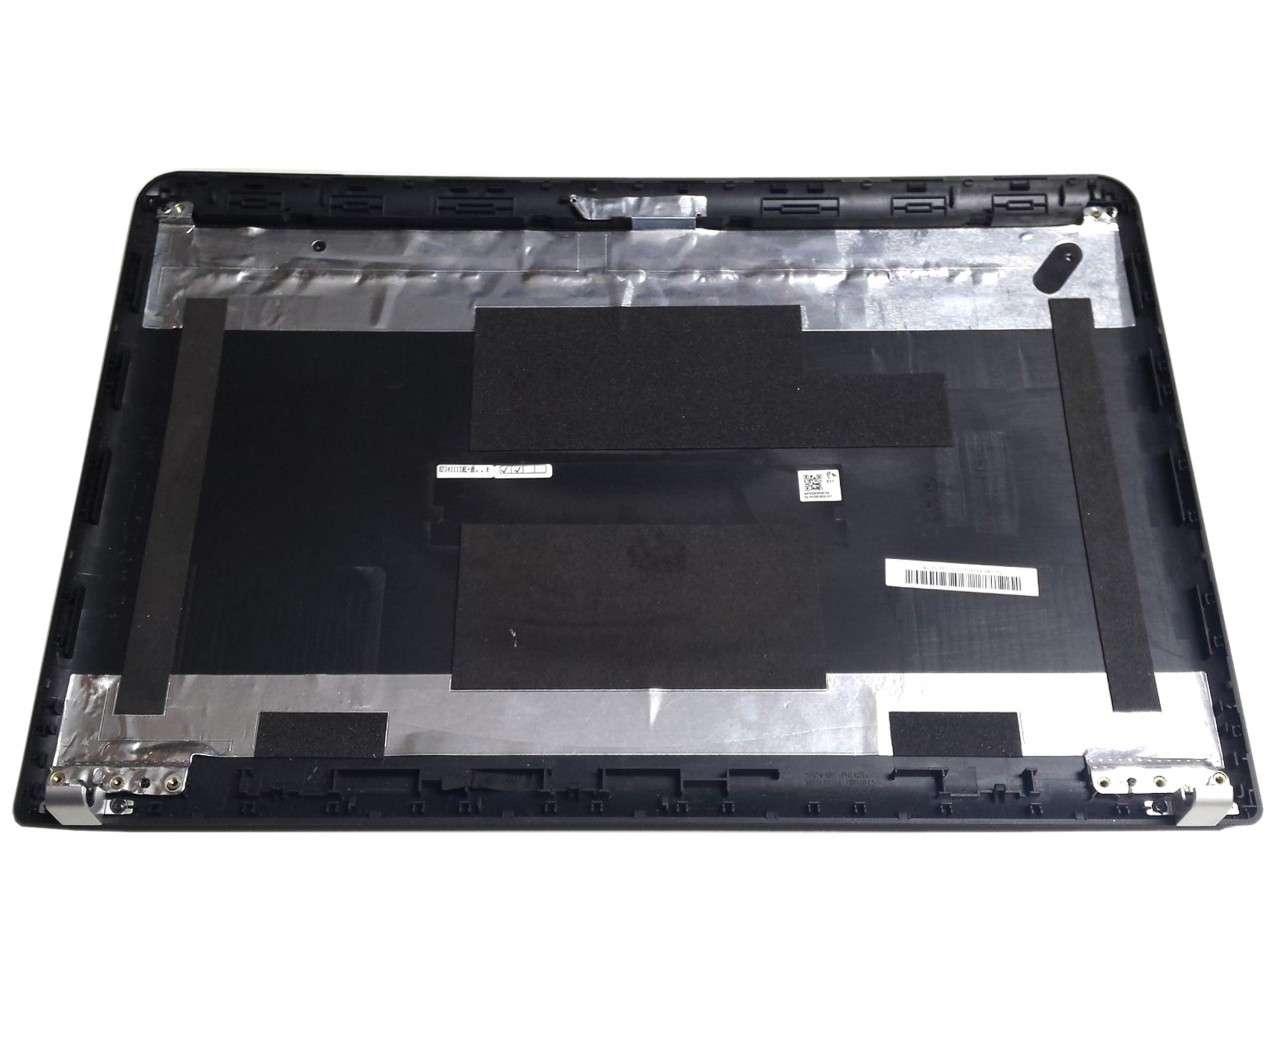 Capac Display BackCover Lenovo ThinkPad E531 Carcasa Display Neagra imagine powerlaptop.ro 2021